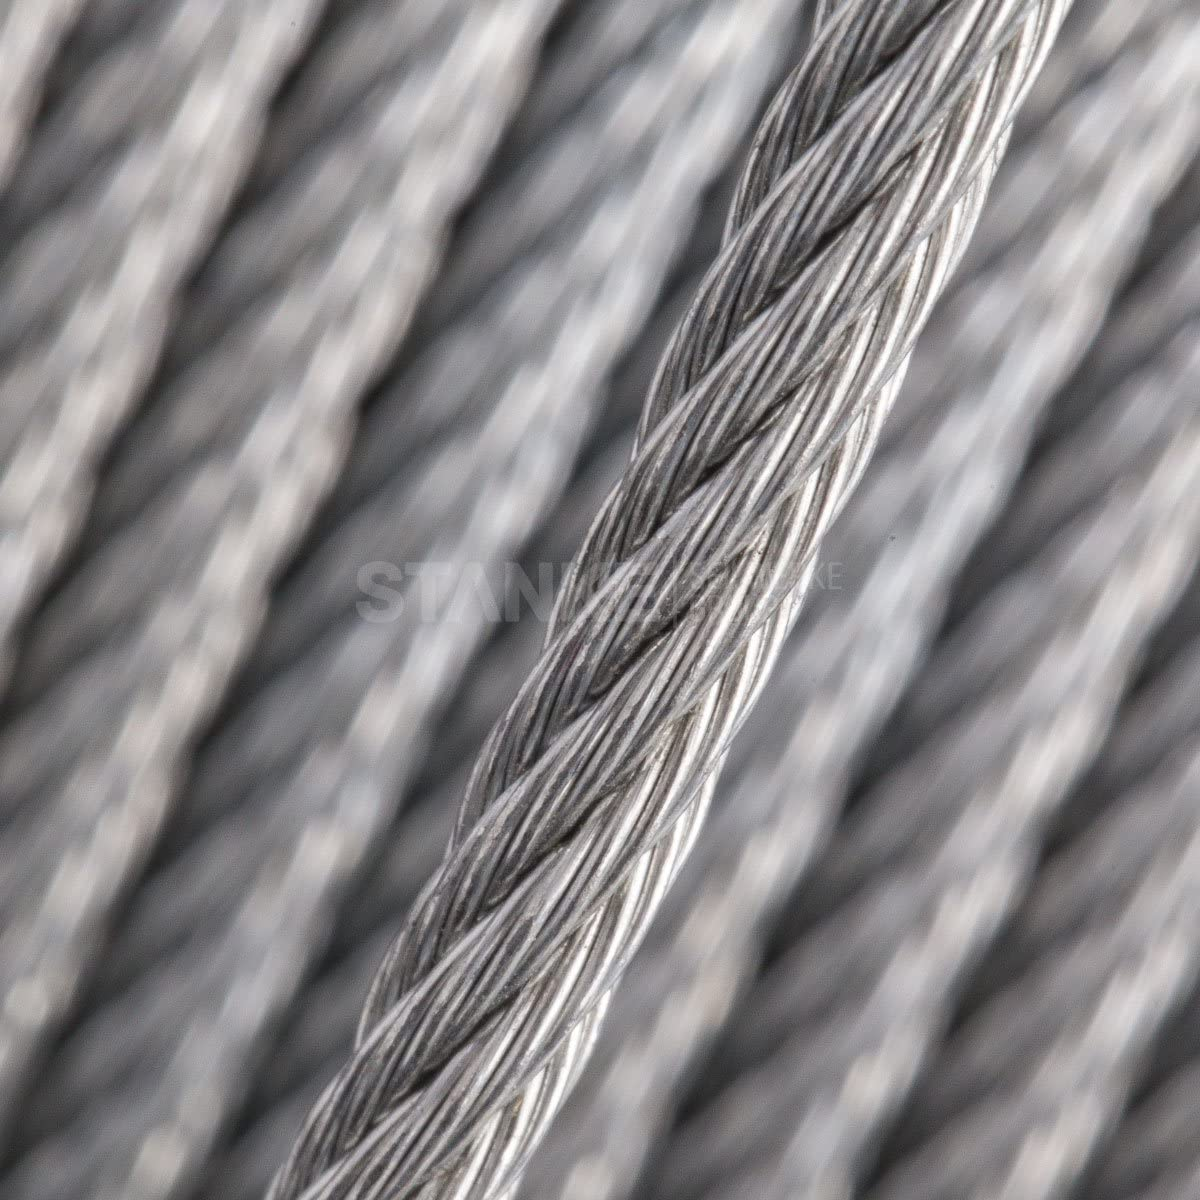 Seilwerk STANKE 10 x Simplex Klemme Gr/ö/ße 5 f/ür 5 mm Drahtseile Seilklemme Verzinkt Stahlseil